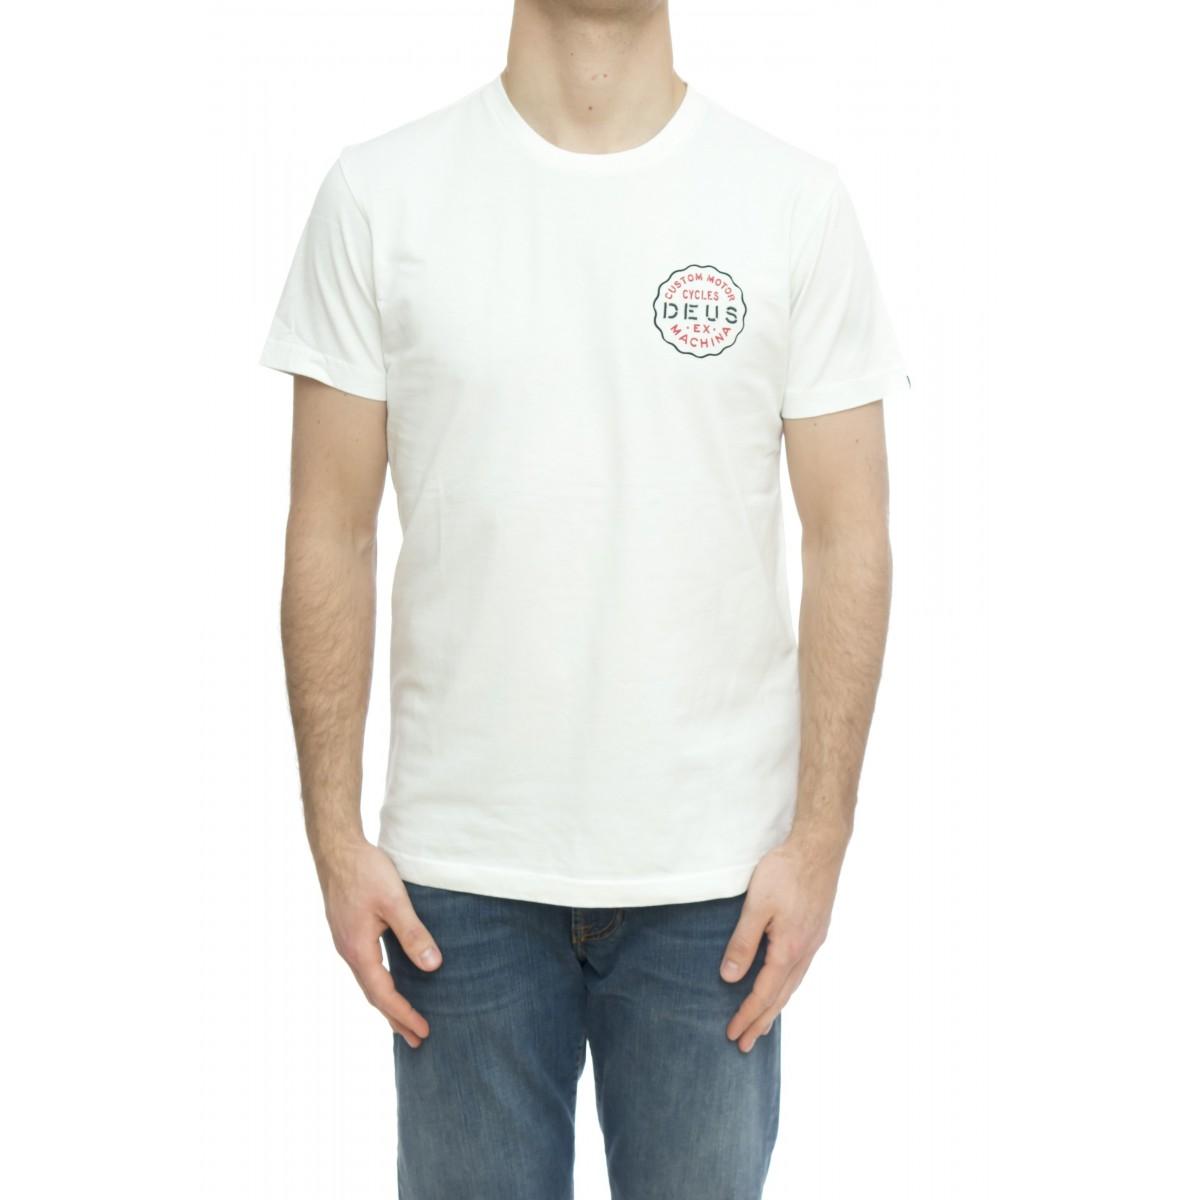 T-shirt - Tee0348 t-shirt ricamo ditero